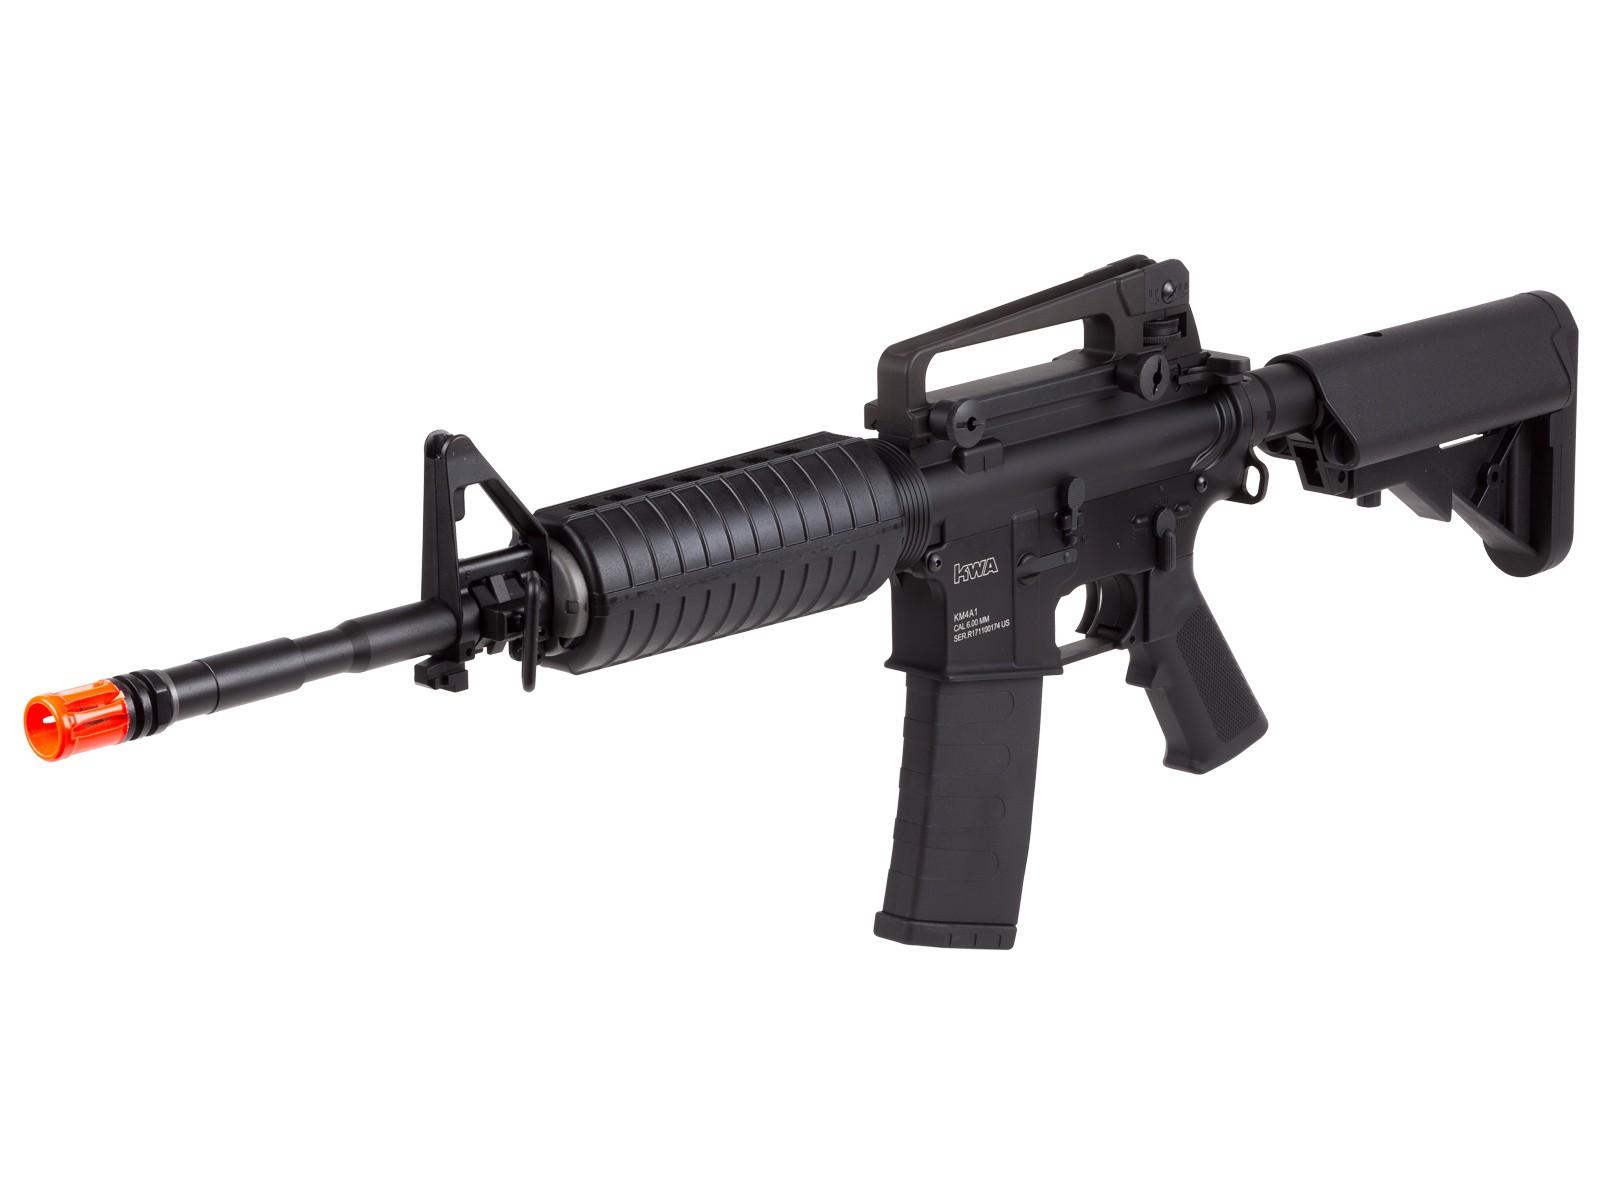 KWA_KM4A1_Metal_Carbine_AEG_2_Airsoft_Rifle_6mm